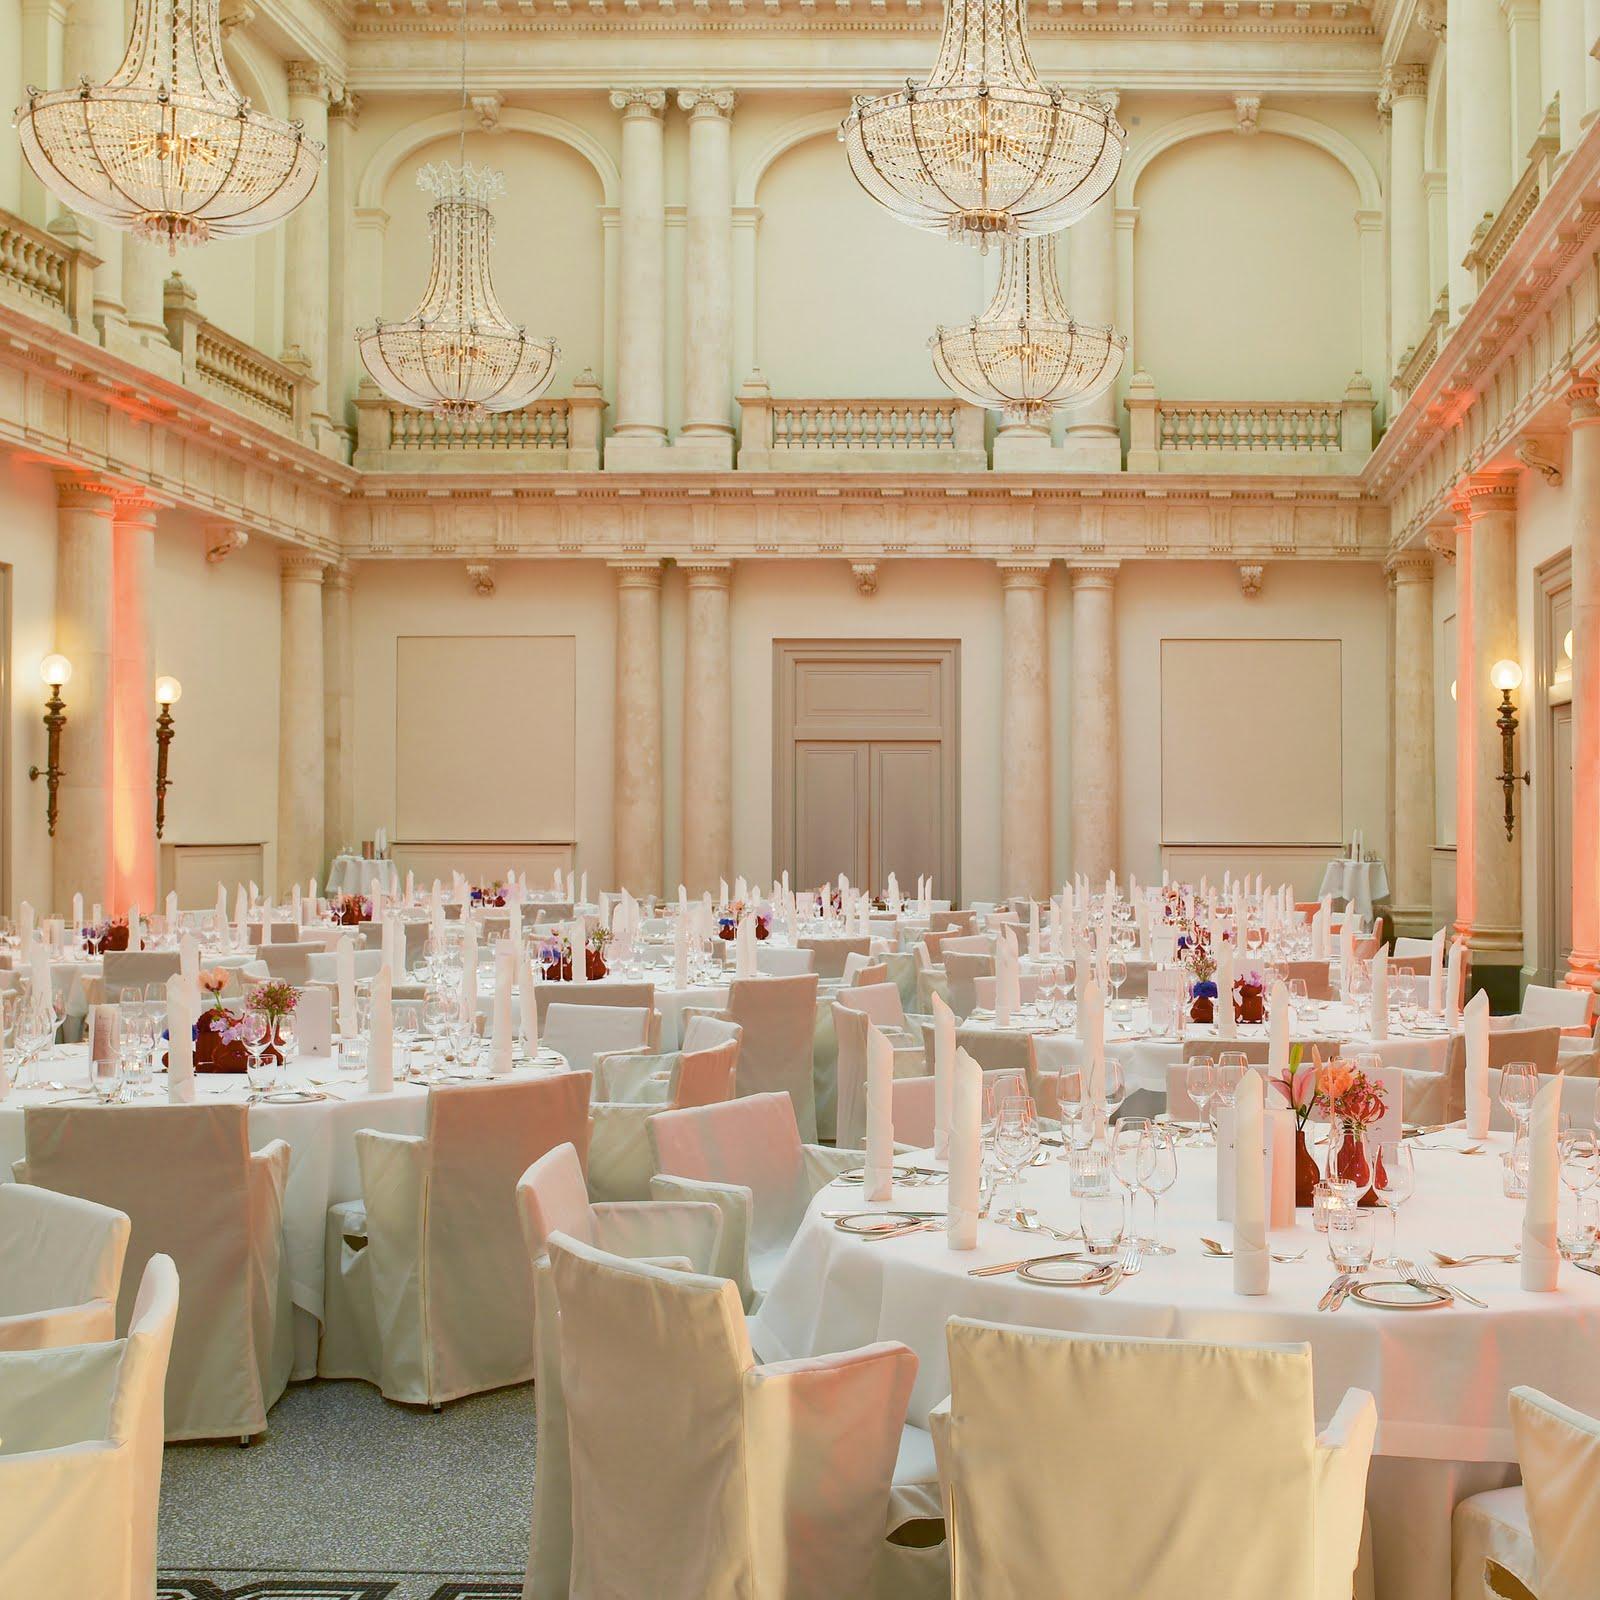 Hotel-de Rome-Berlin-Gendarmenmarkt-Ballroom